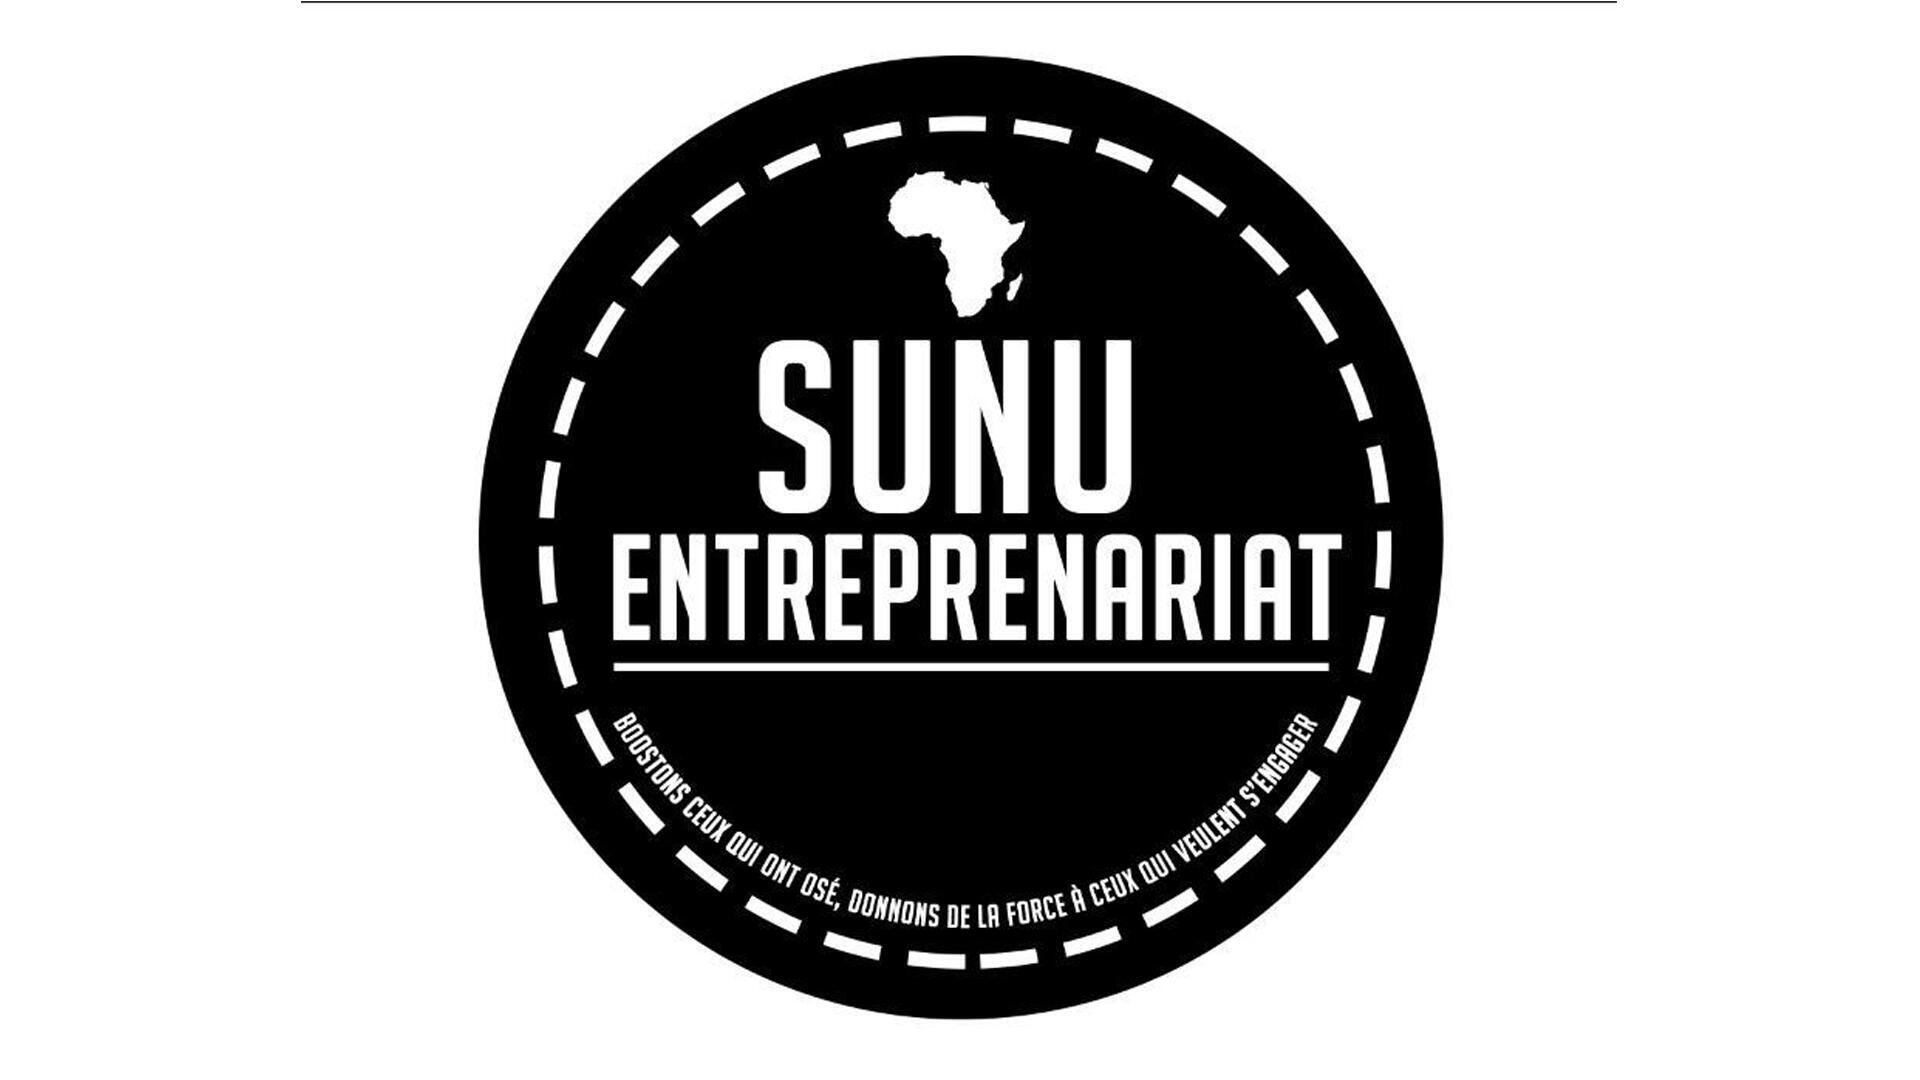 Sunu Entreprenariat.